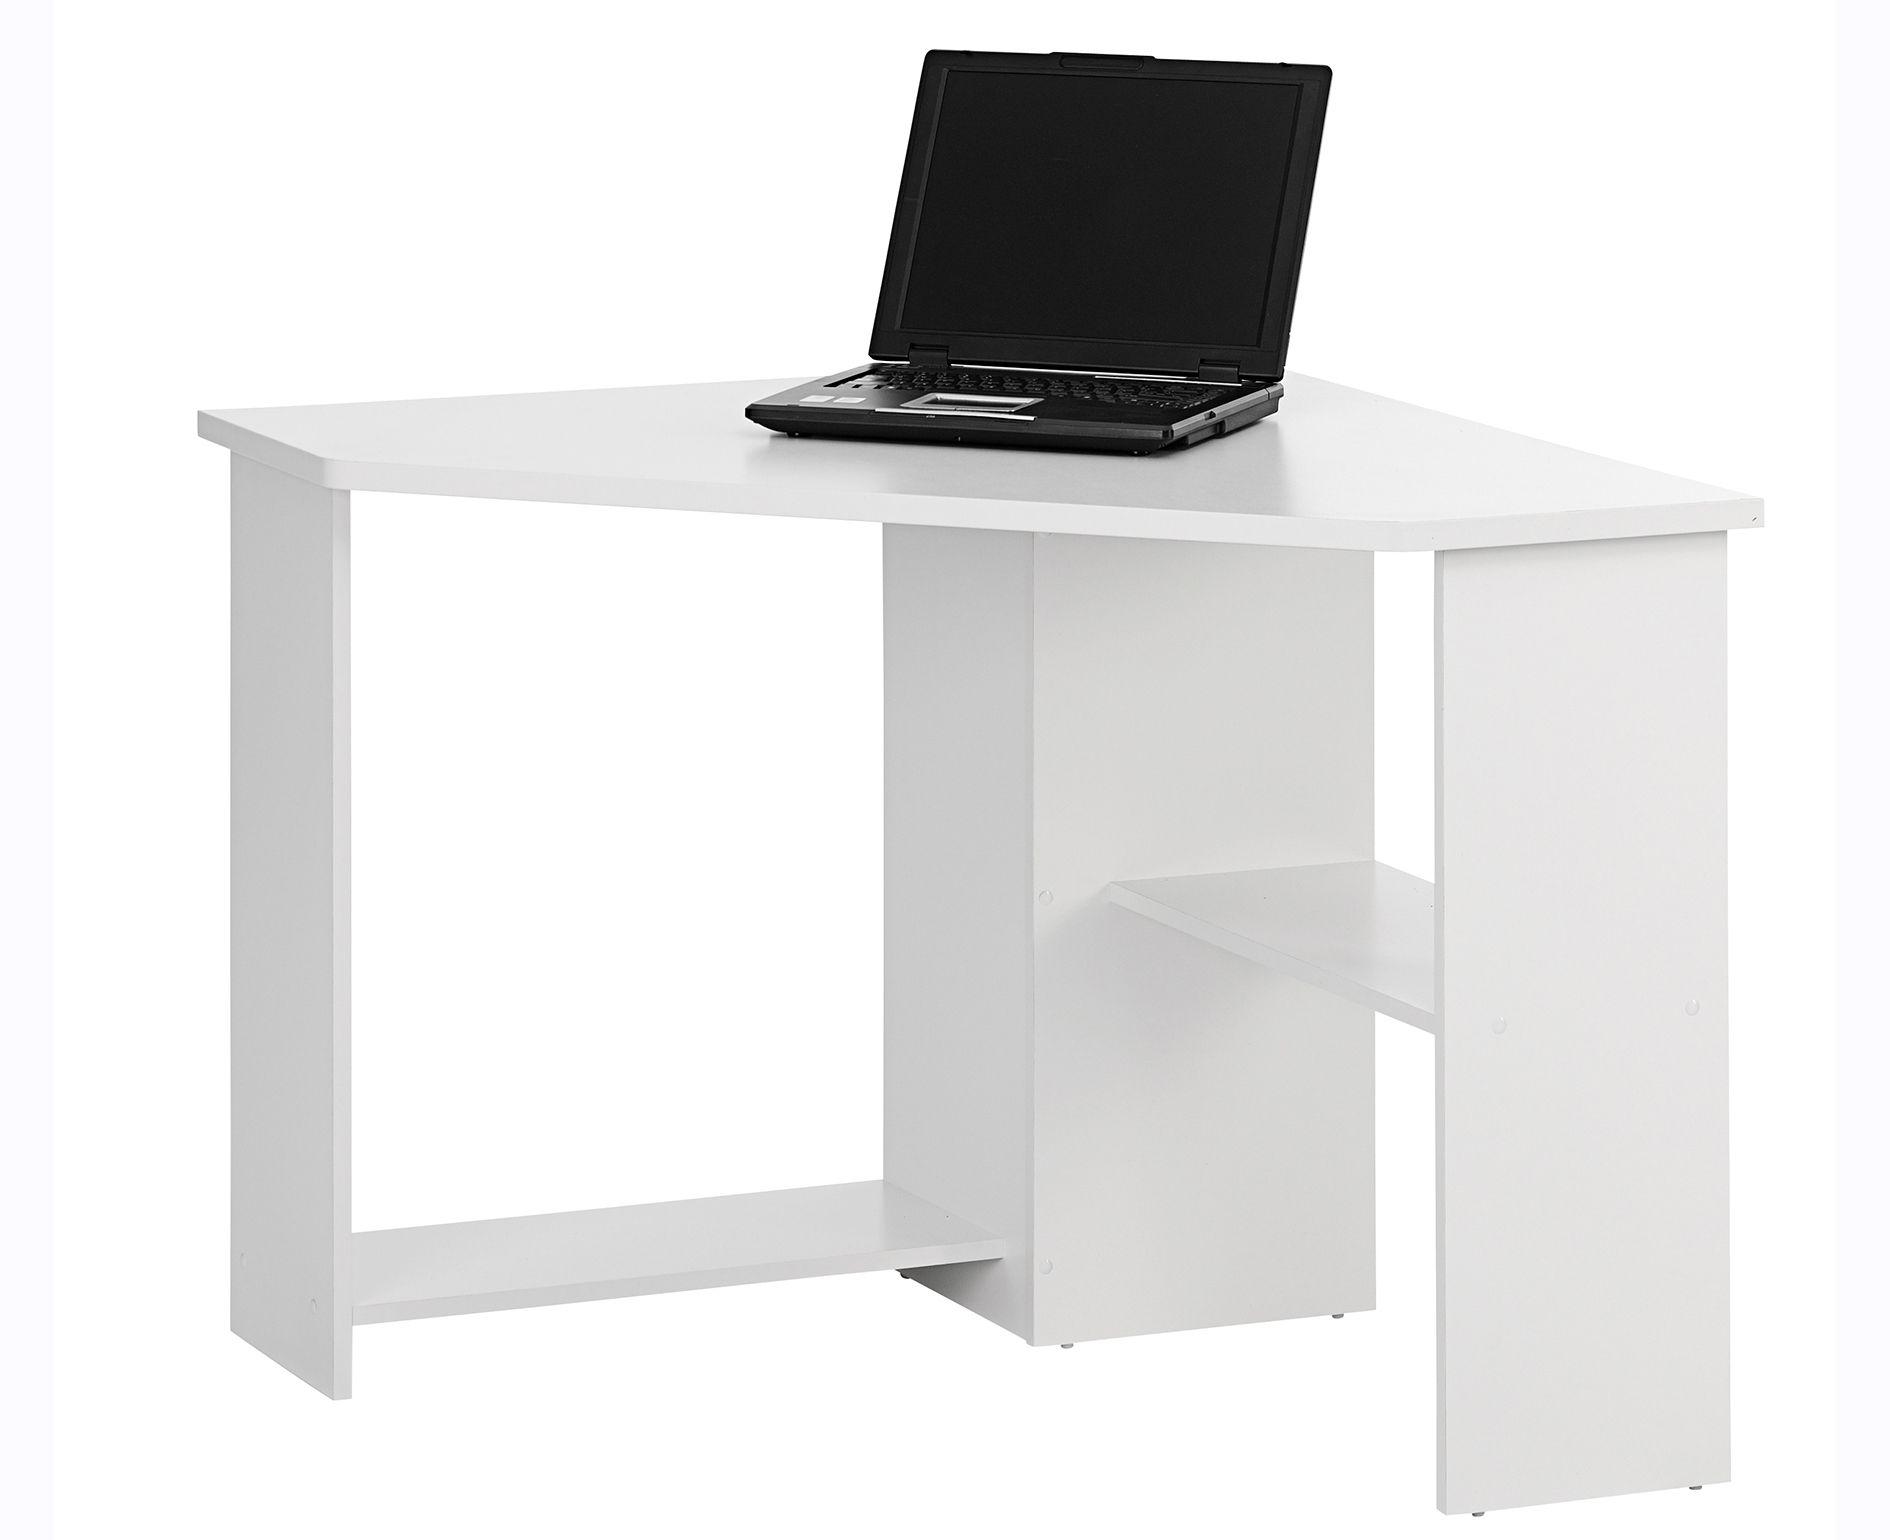 99 Gloss White Corner Desk Home Office Furniture Set Check More At Http Www Sewcraftyjenn Pinterest Decorations